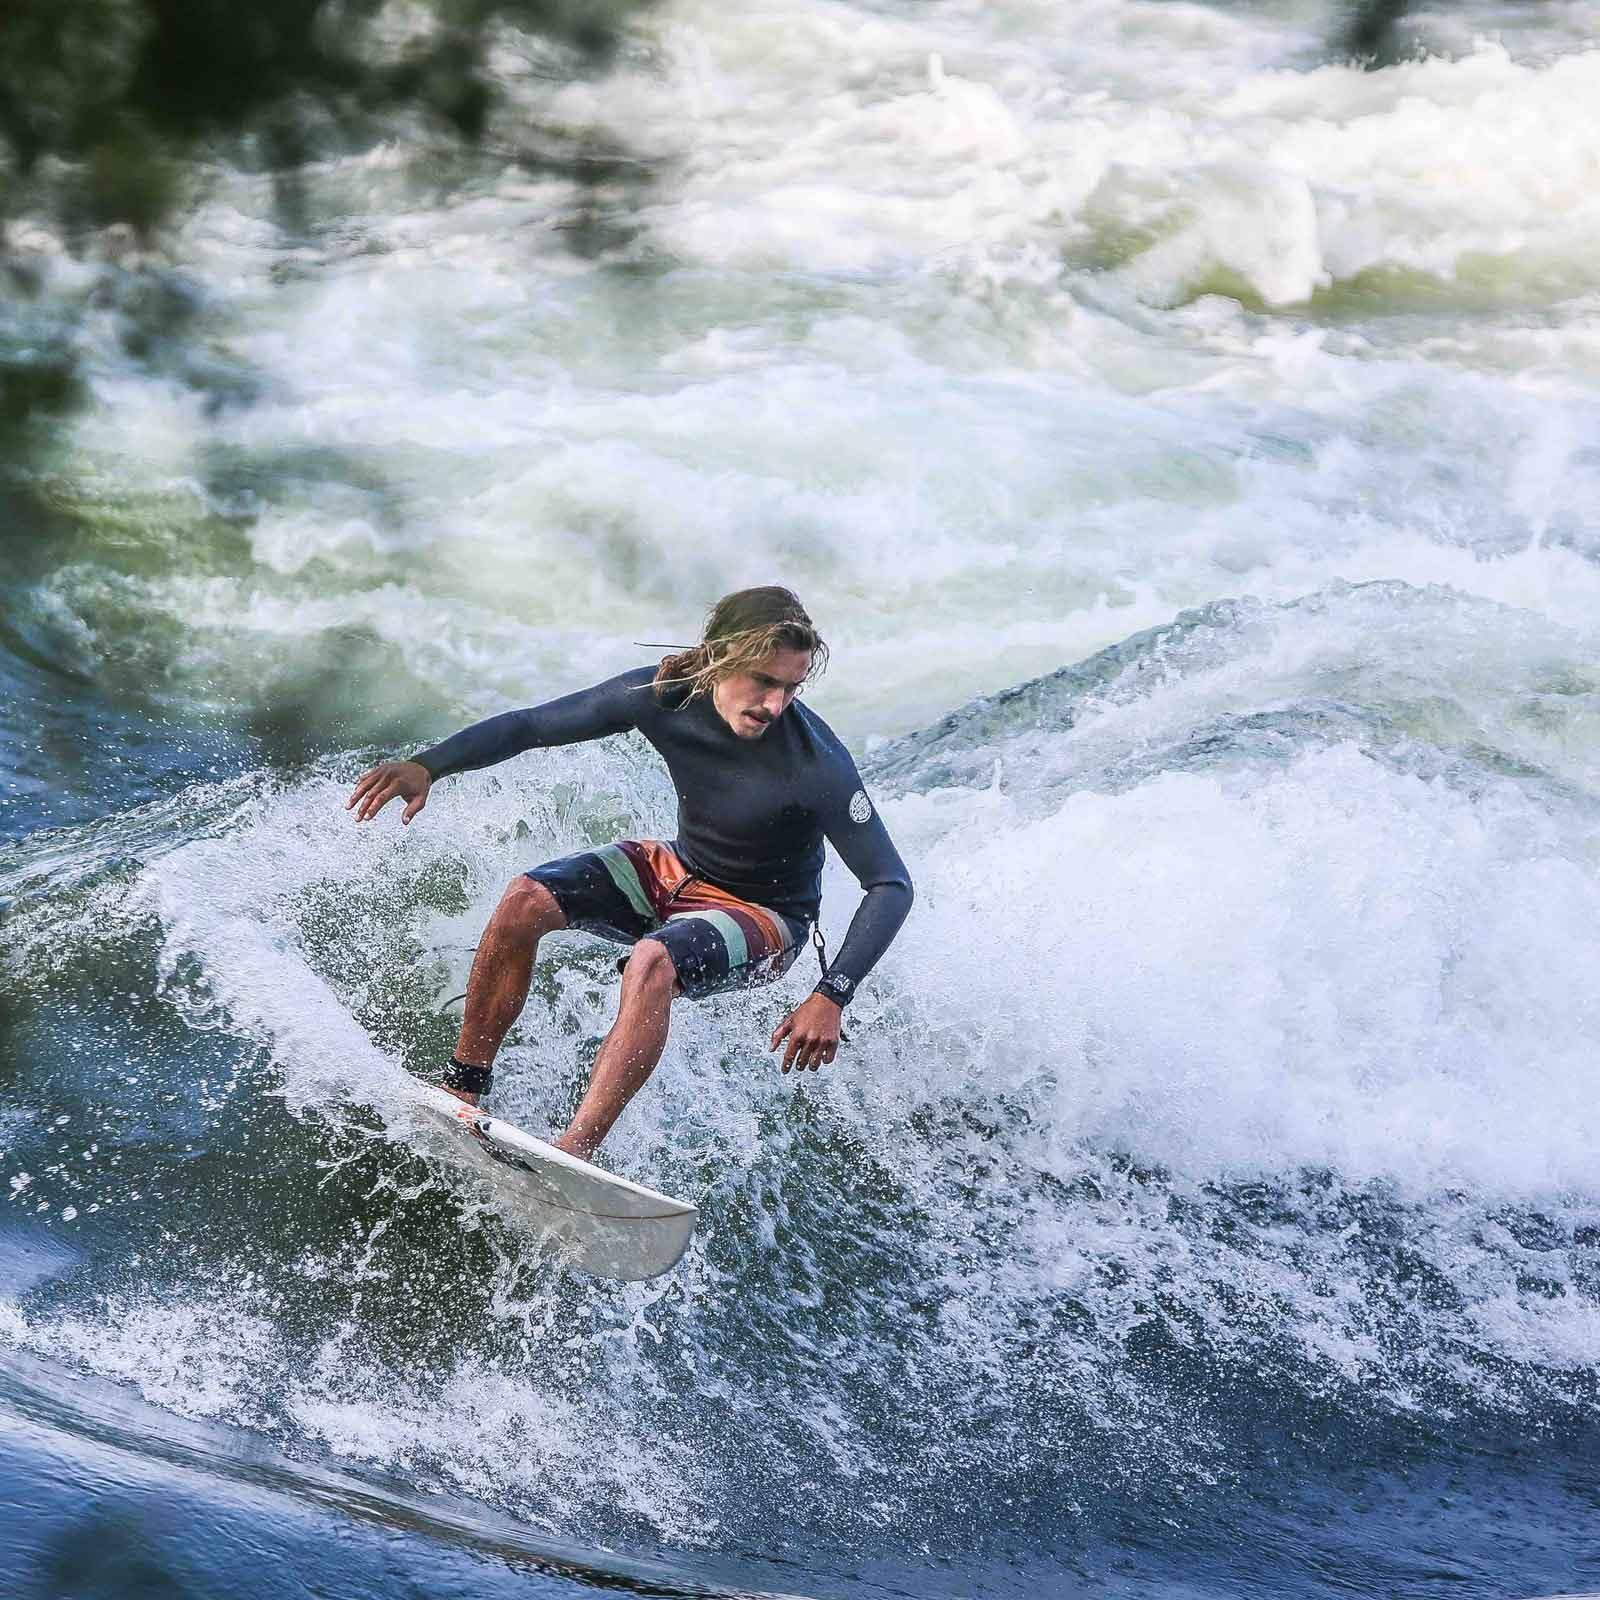 River-Surfing-Credit-photo-Mike-Hitelman